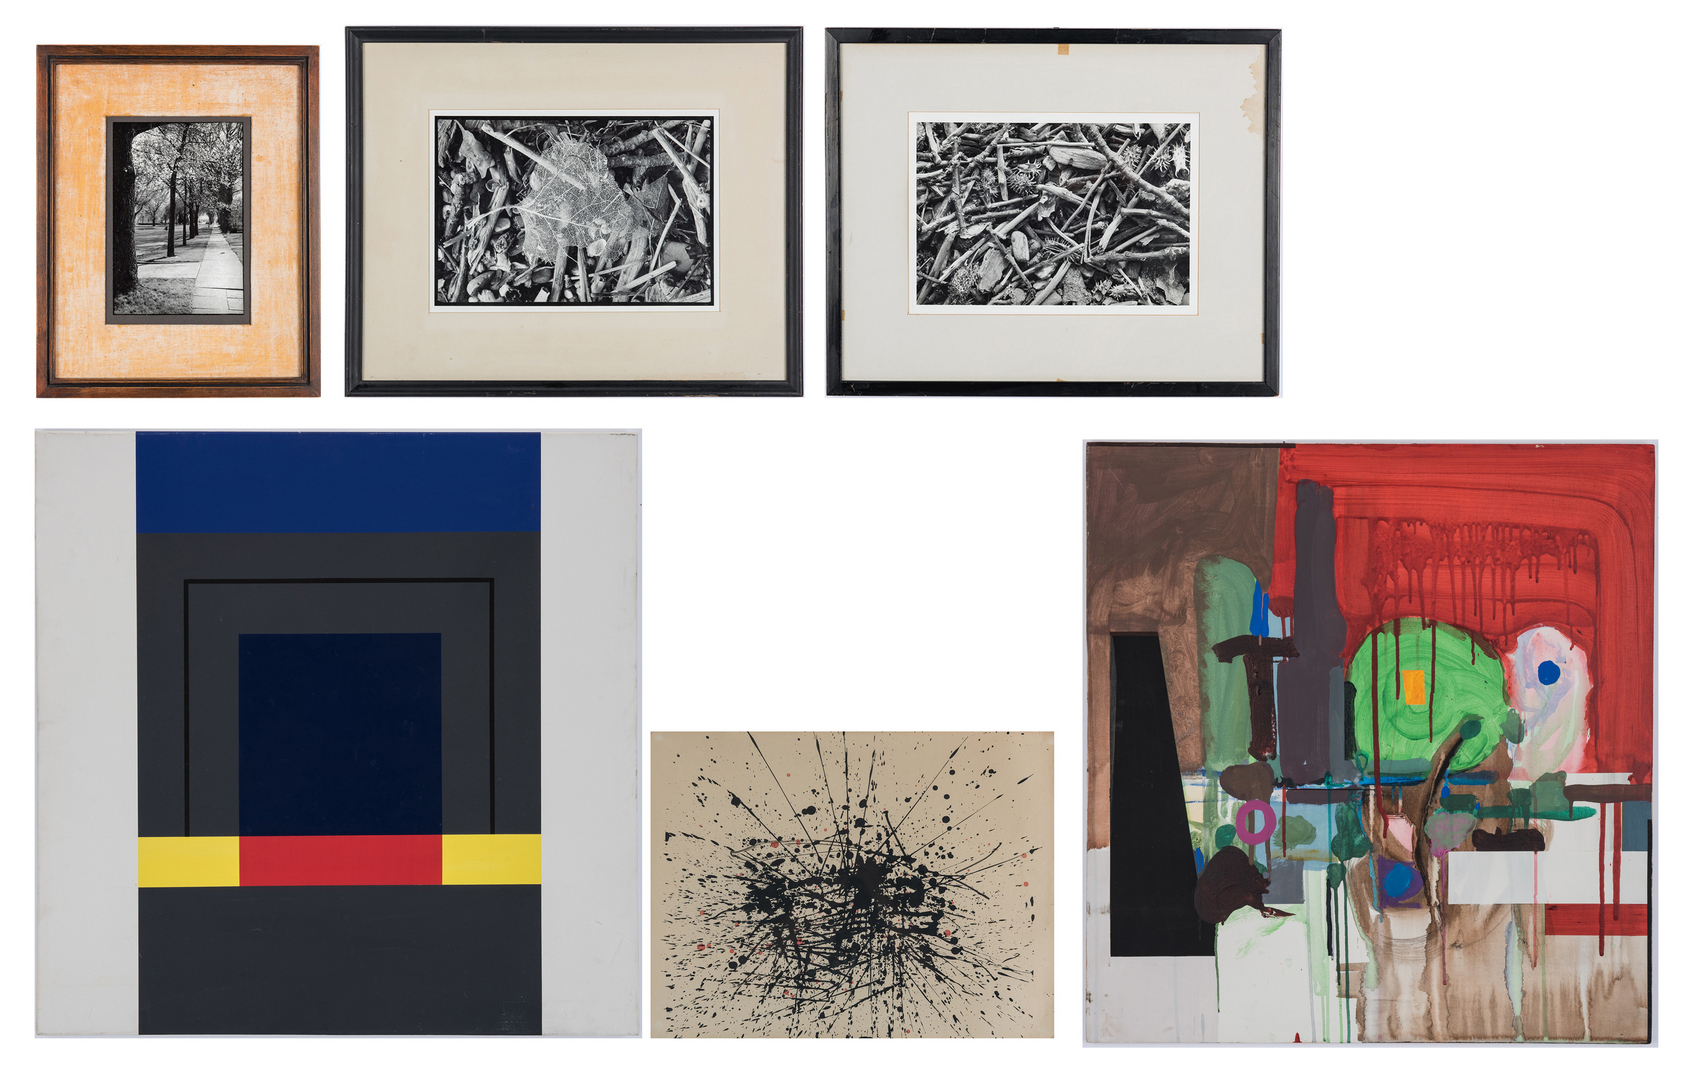 Lot 905: 6 John Stuart Ingle Artworks, incl. O/C Abstract Paintings